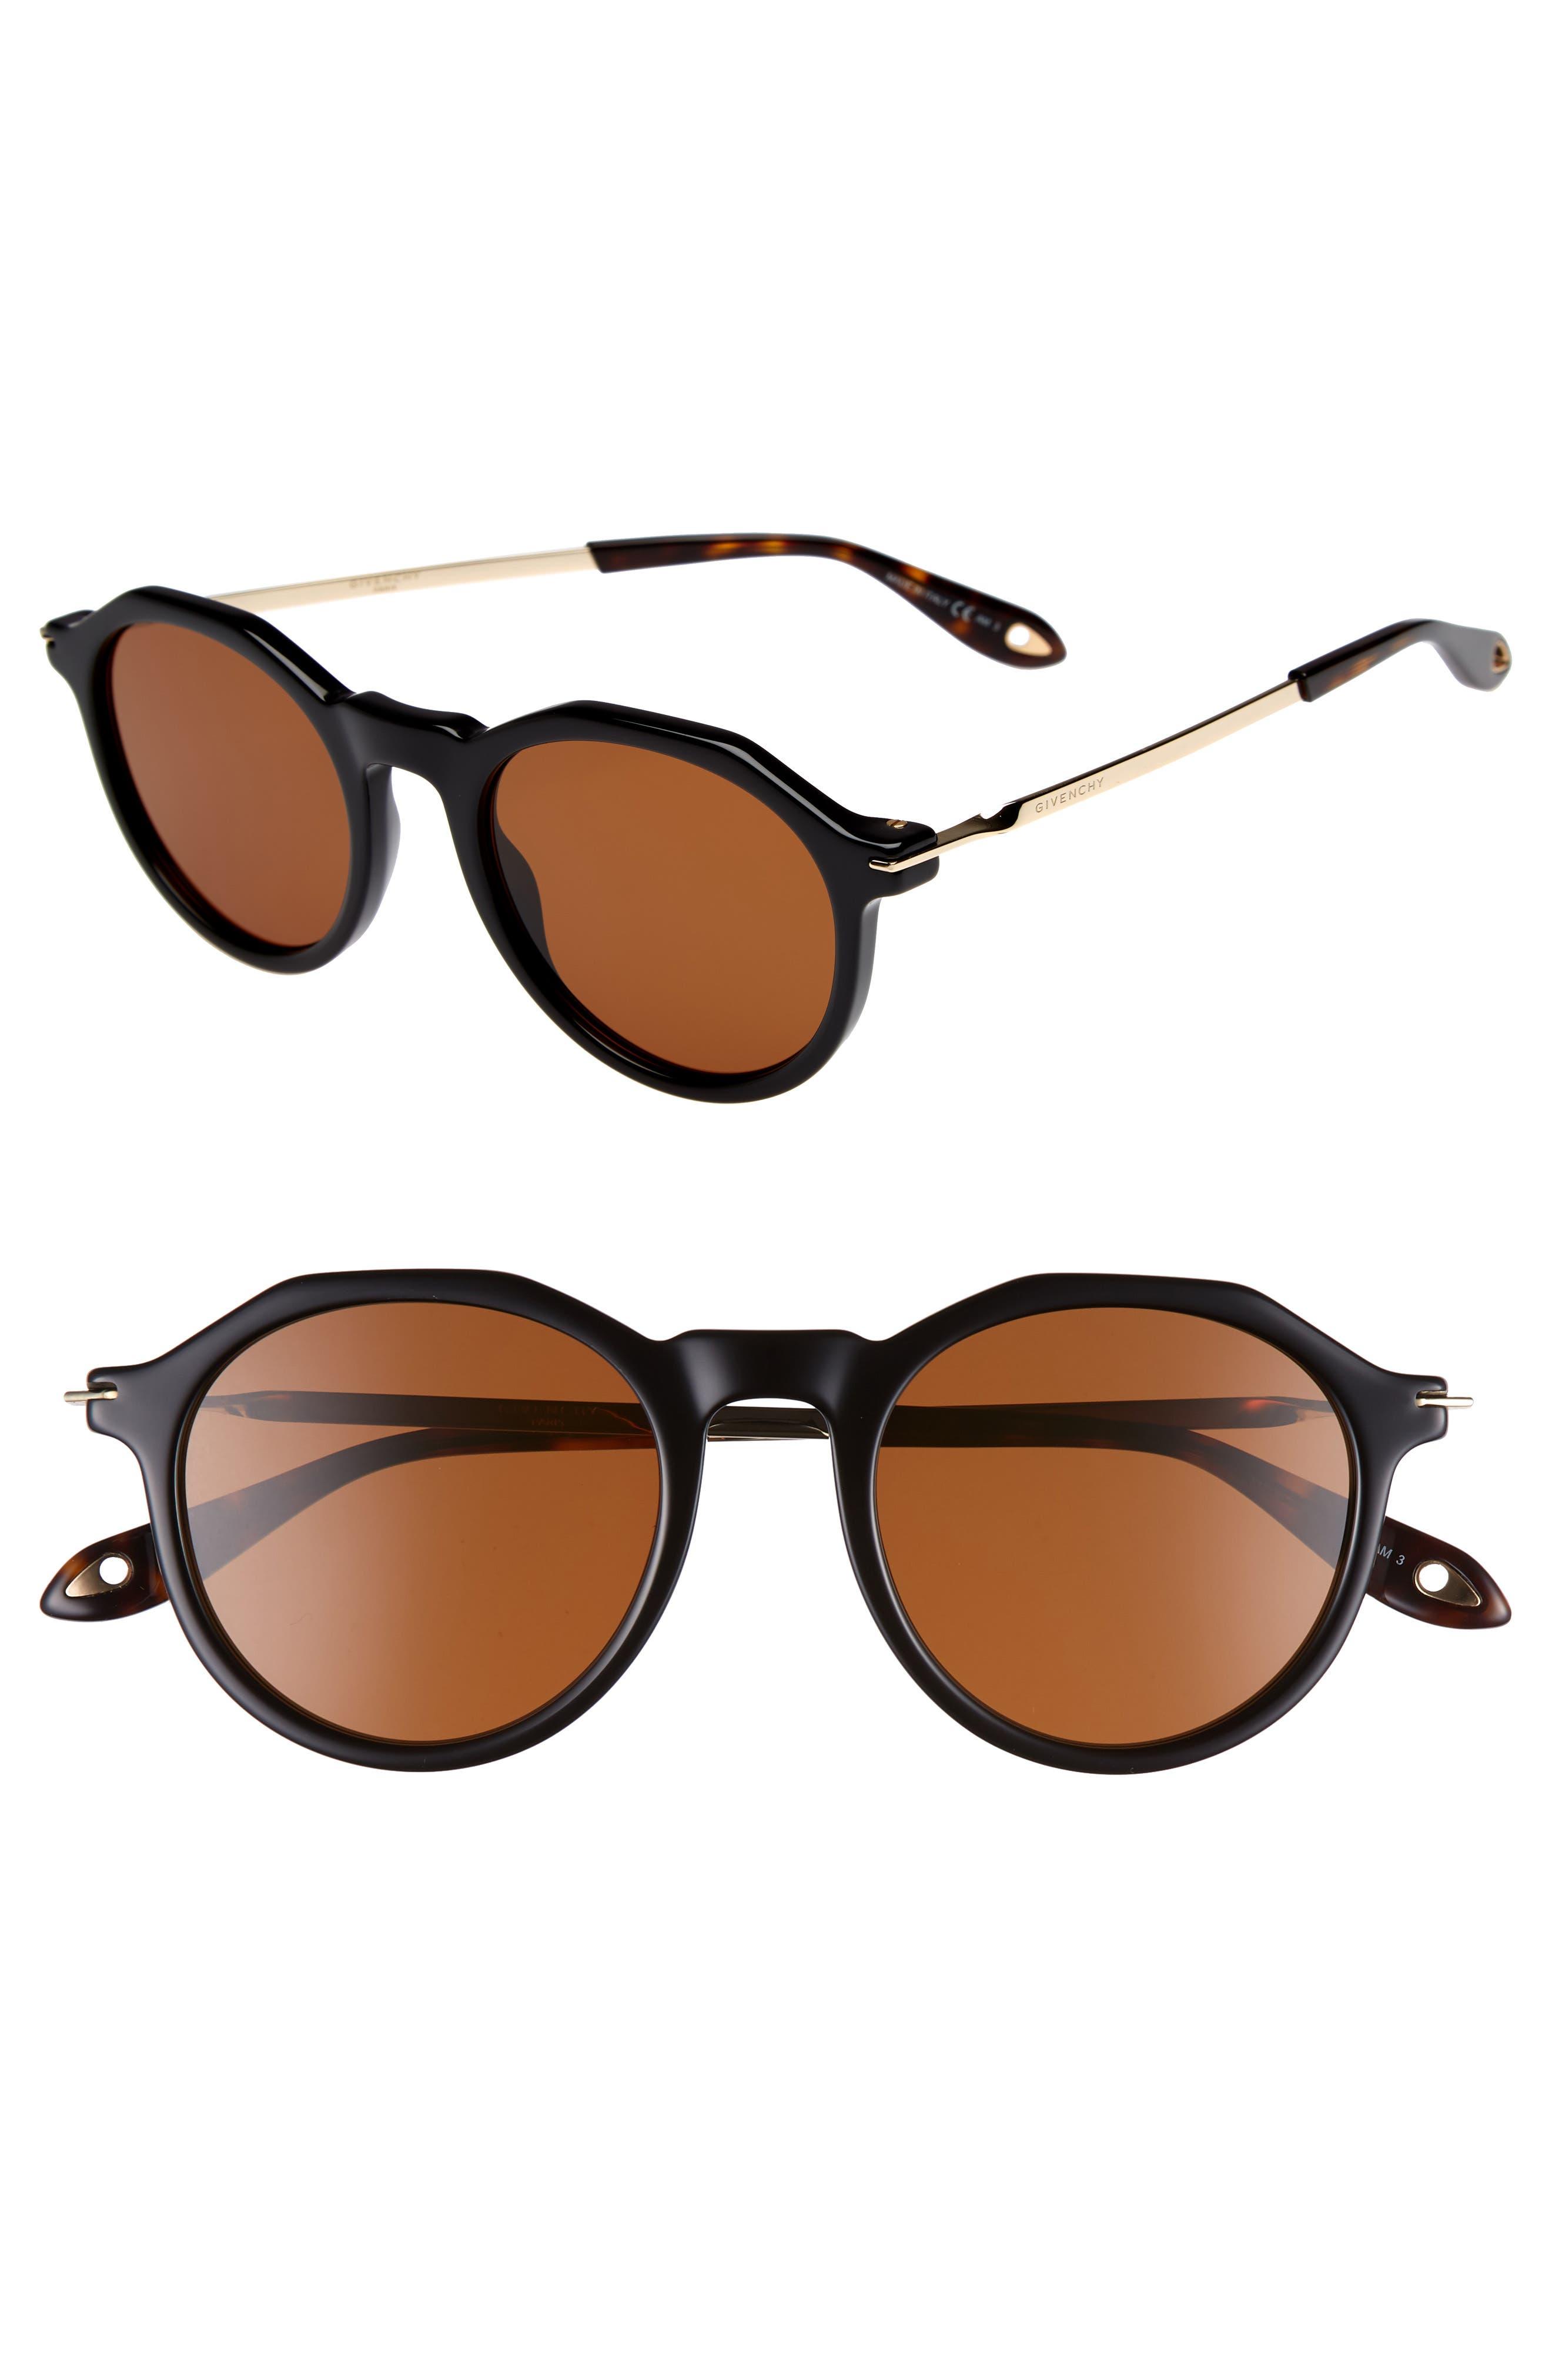 51mm Round Sunglasses,                         Main,                         color,